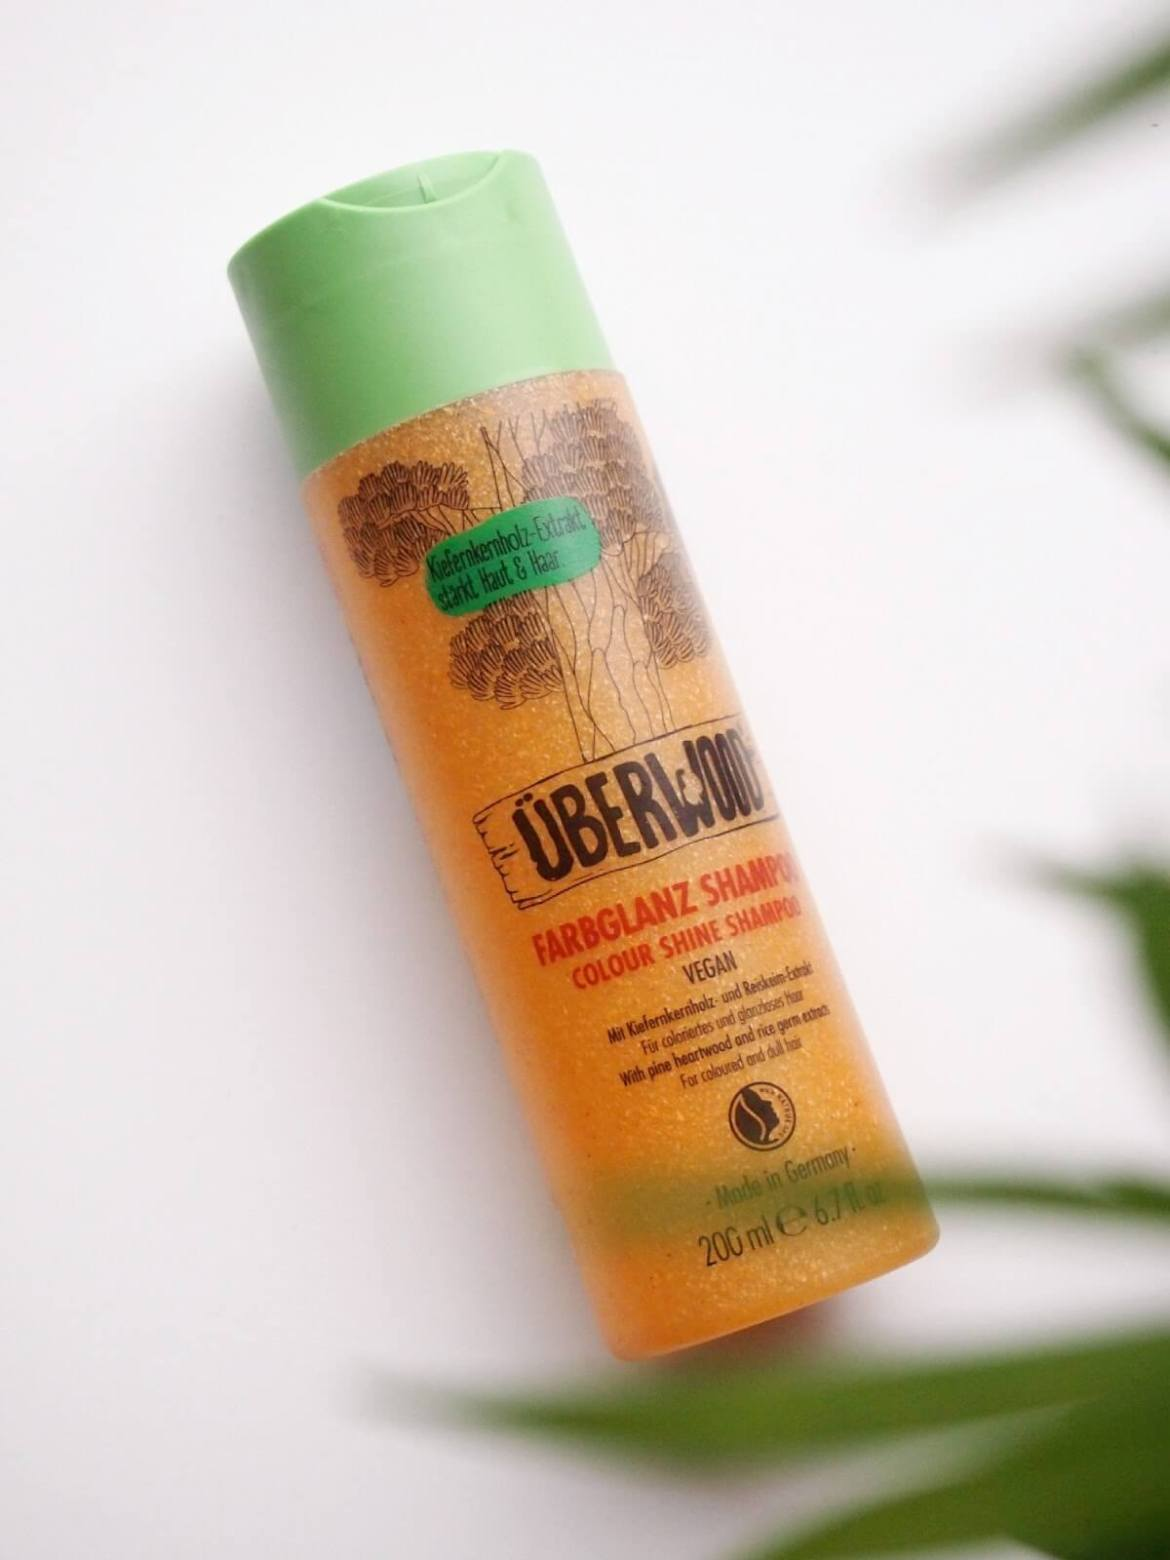 uberwood shampoo